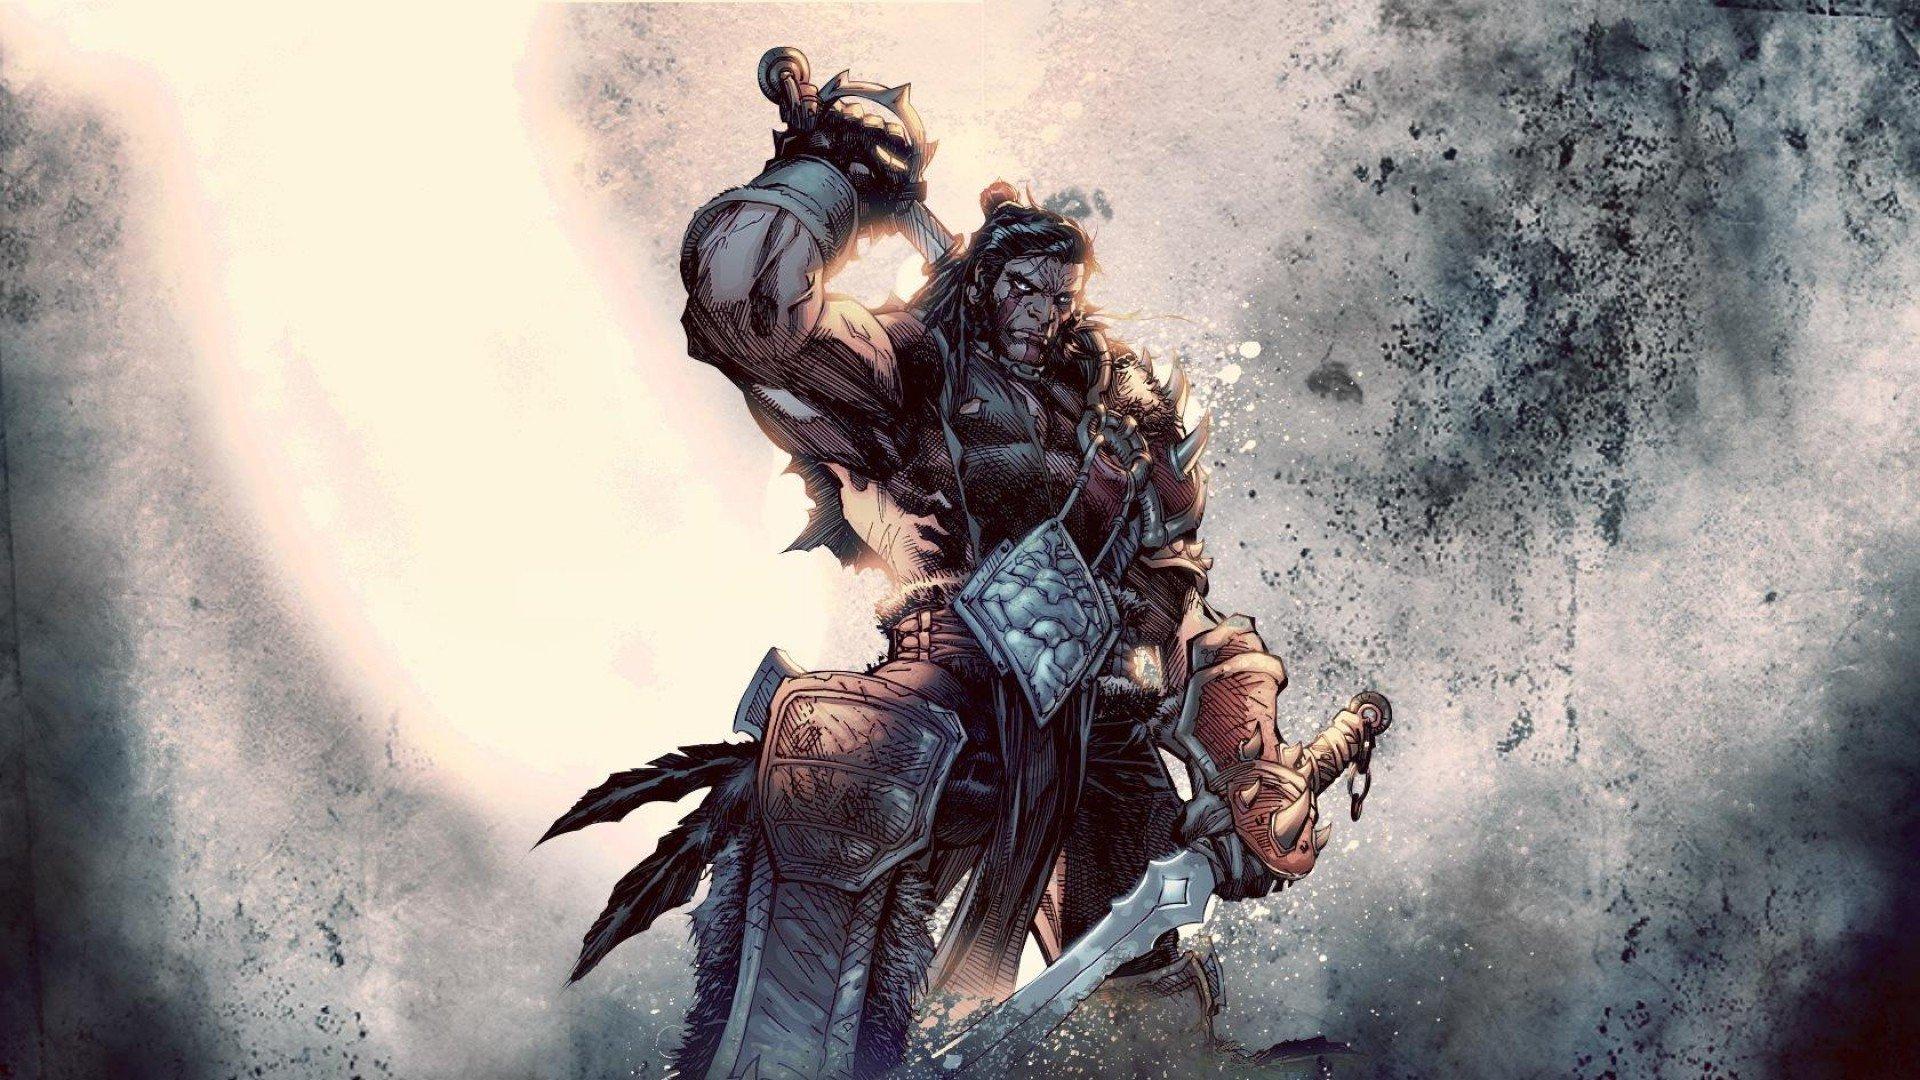 World Of Warcraft 4k Wallpaper: Sword World Of Warcraft, HD Games, 4k Wallpapers, Images